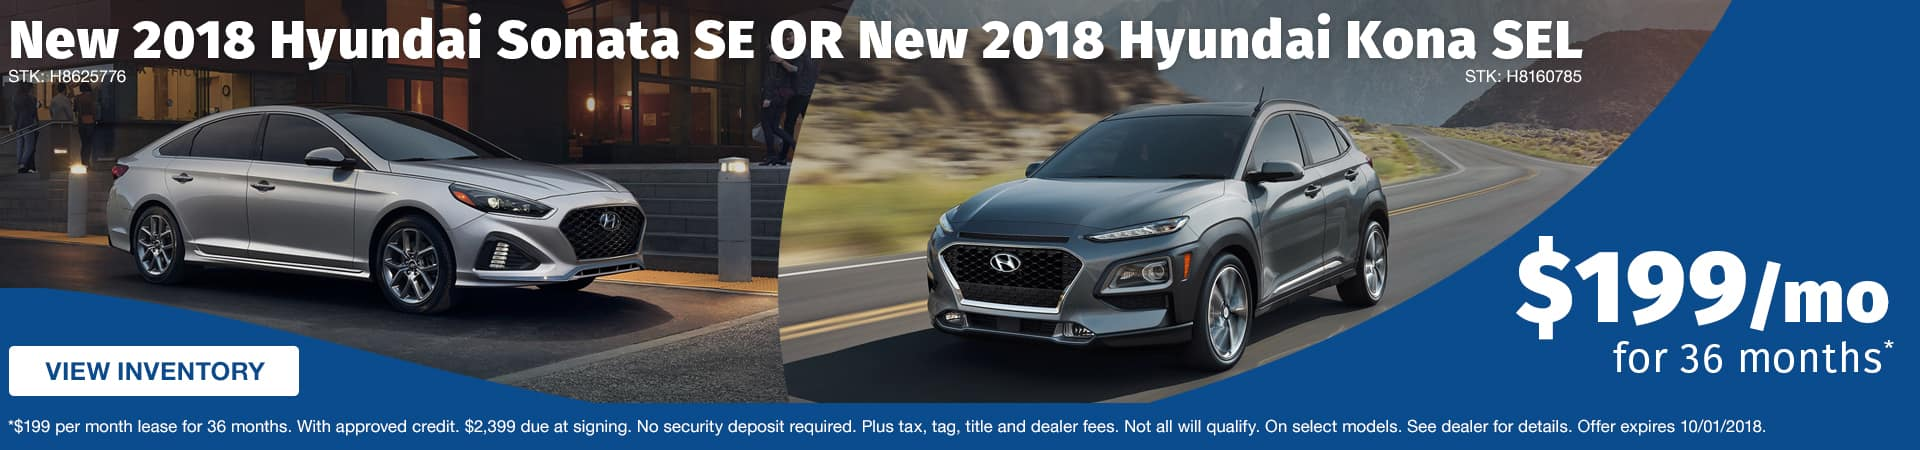 Drive a new 2018 Hyundai Sonata SE or Kona SEL for just $199 a month in Murfreesboro TN